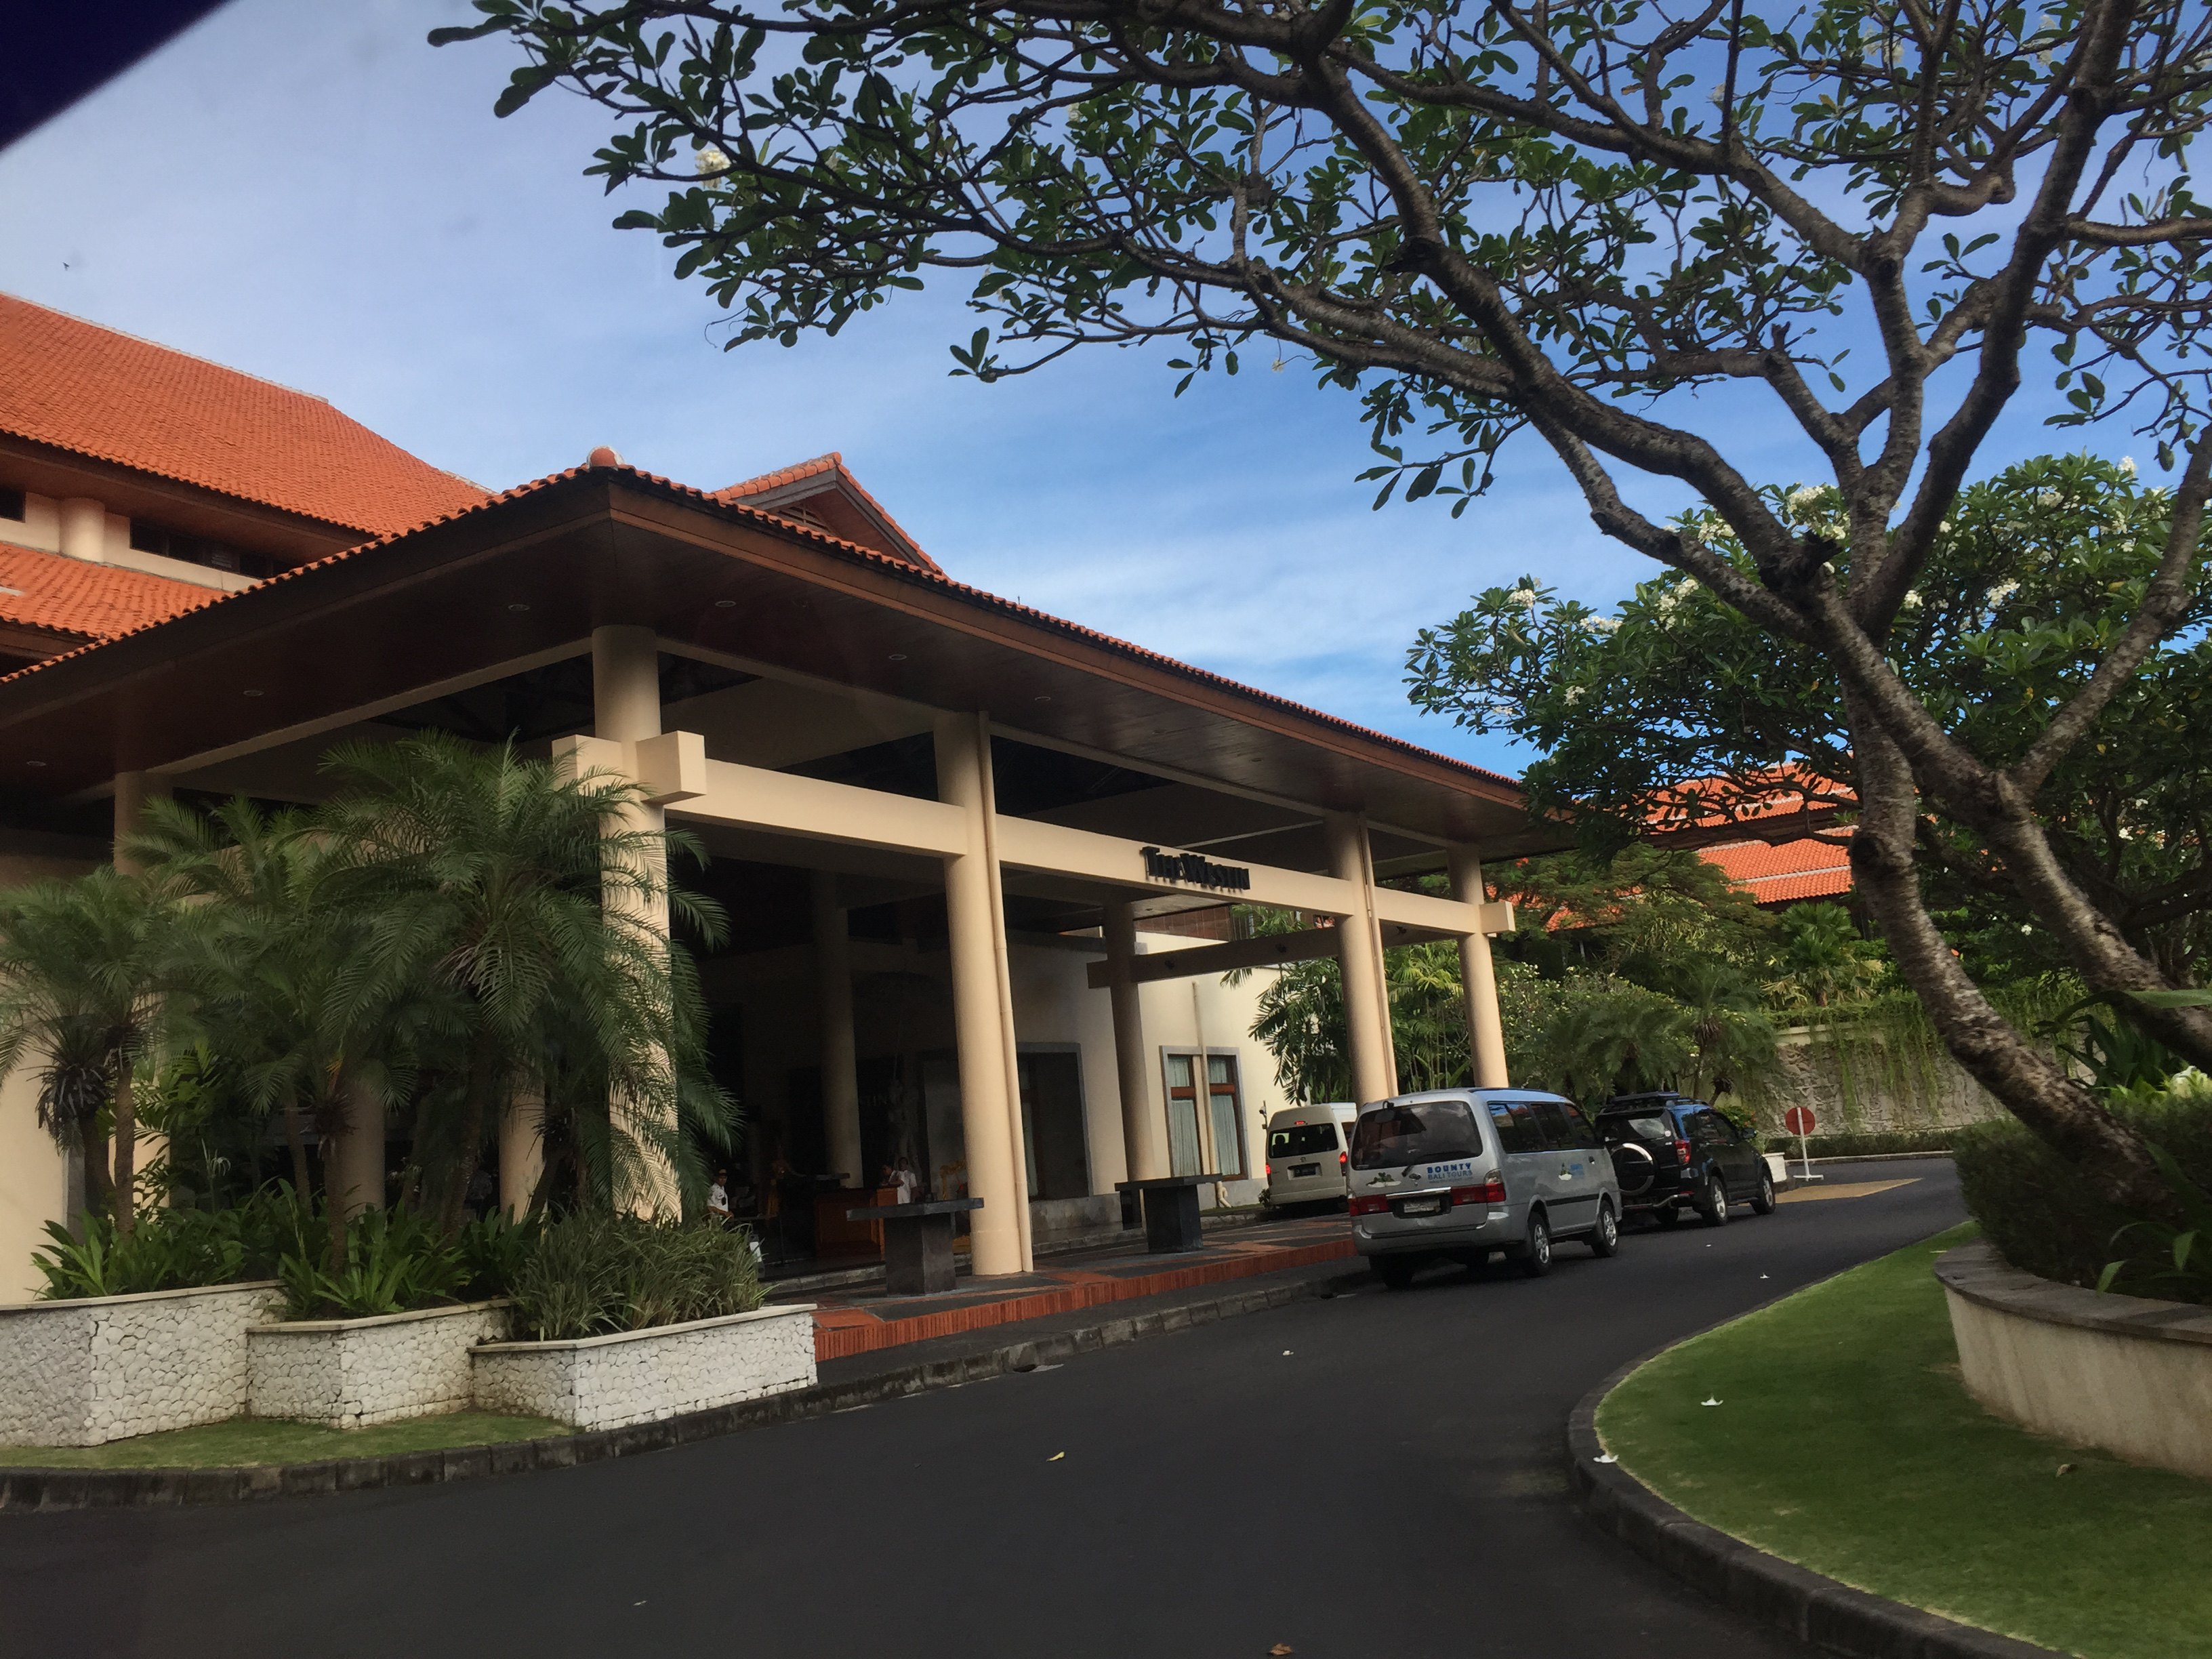 westin resort bali (巴厘岛威斯汀酒店)